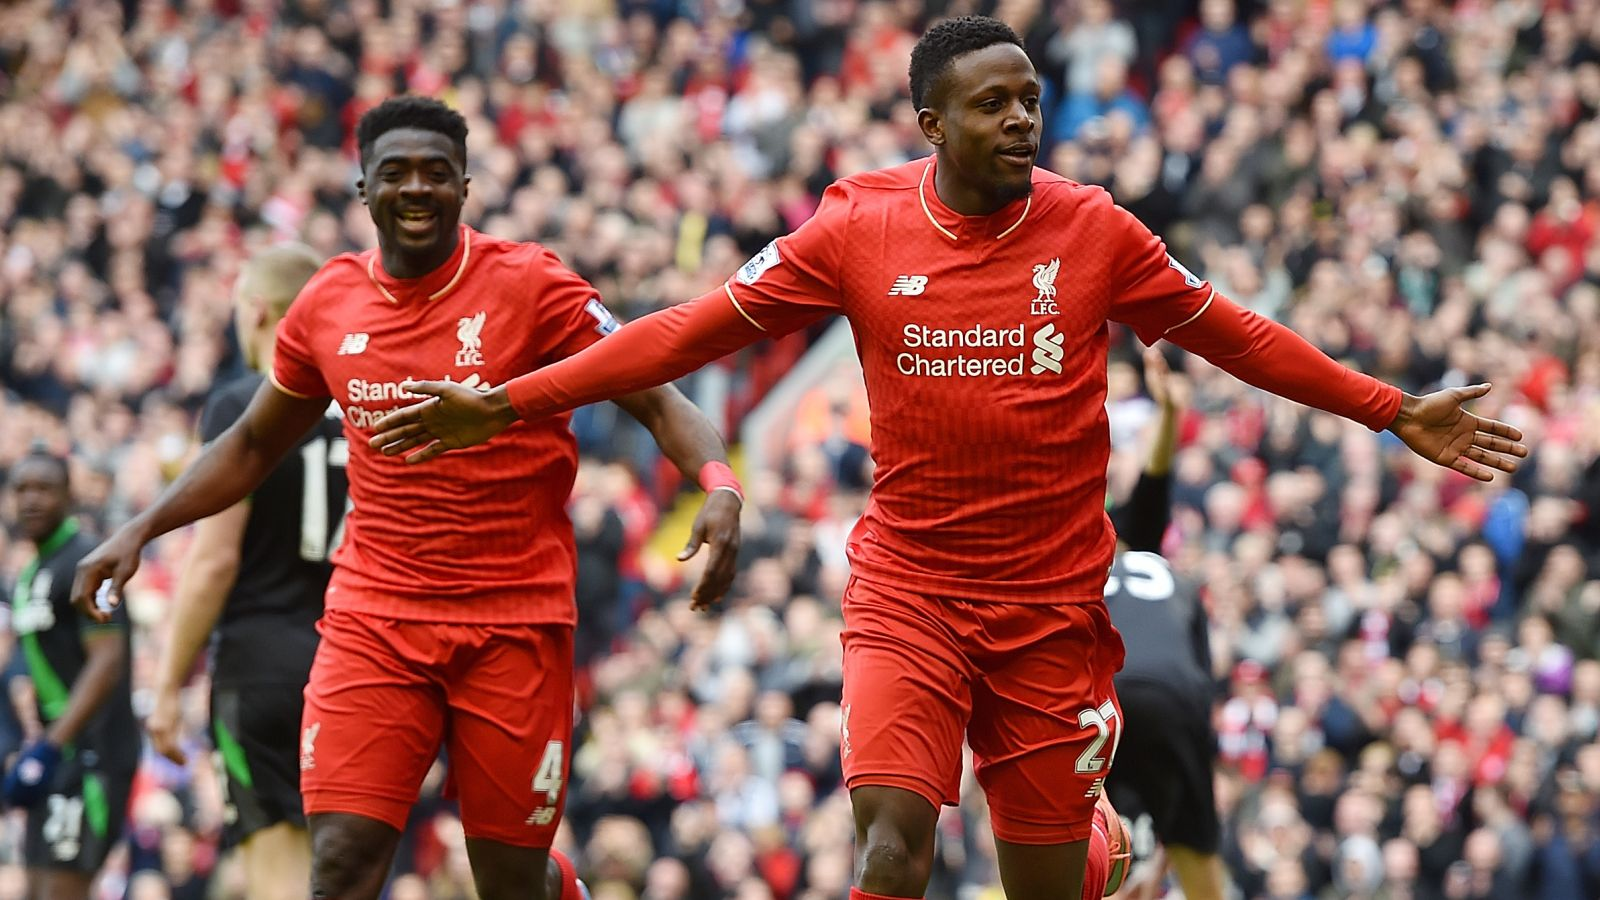 Origi nets brace as Liverpool thrash Stoke in EPL